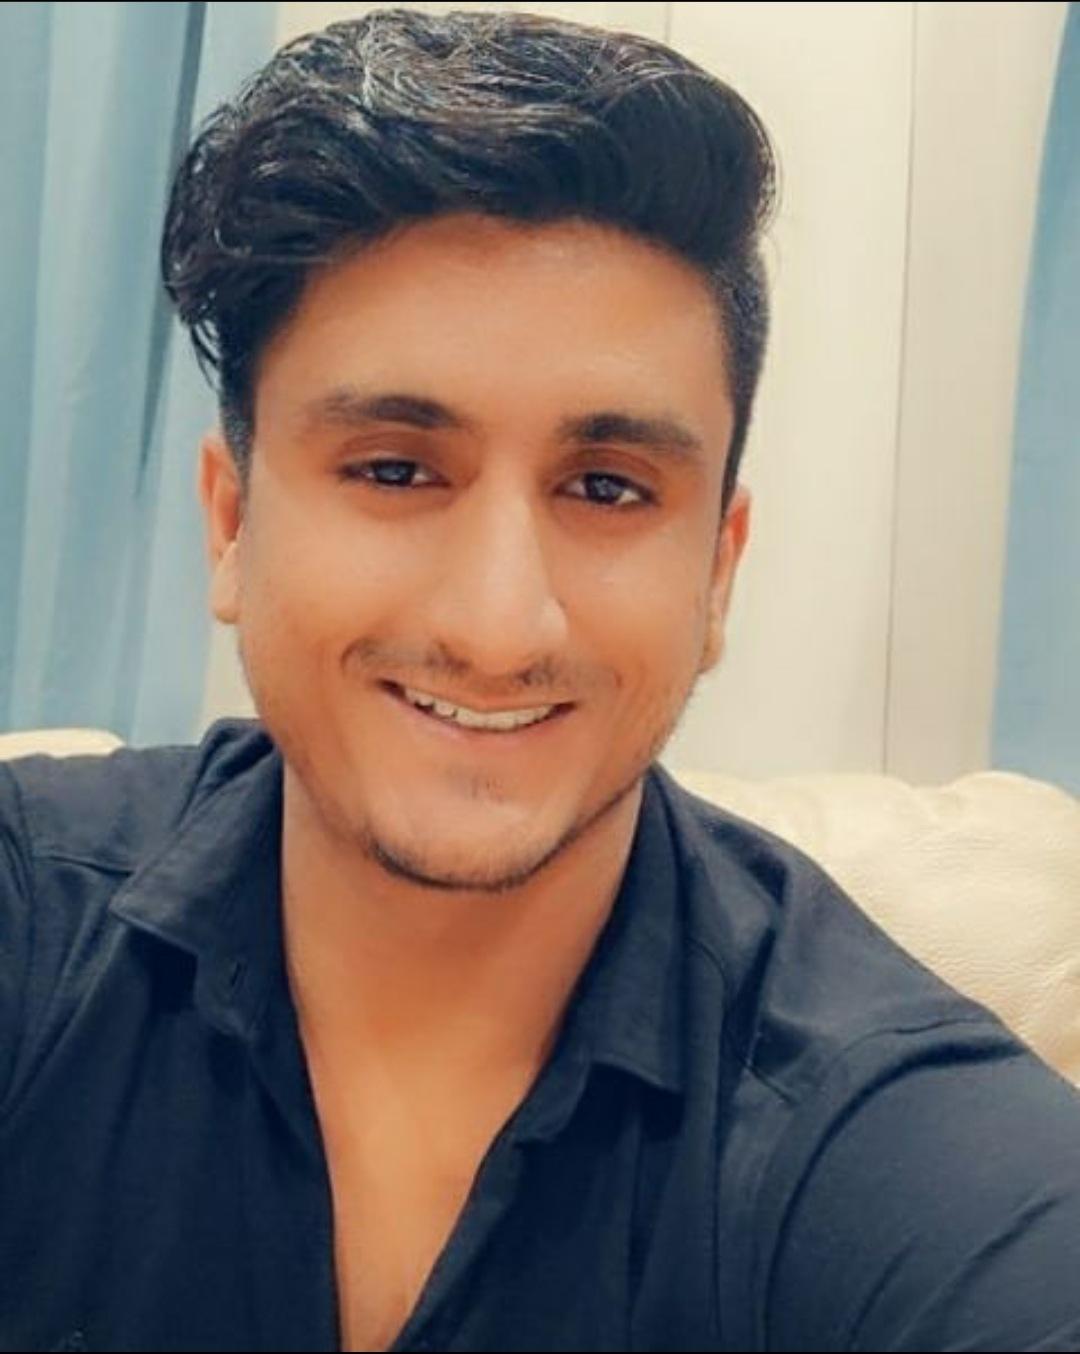 Mr. Nitesh Meghani